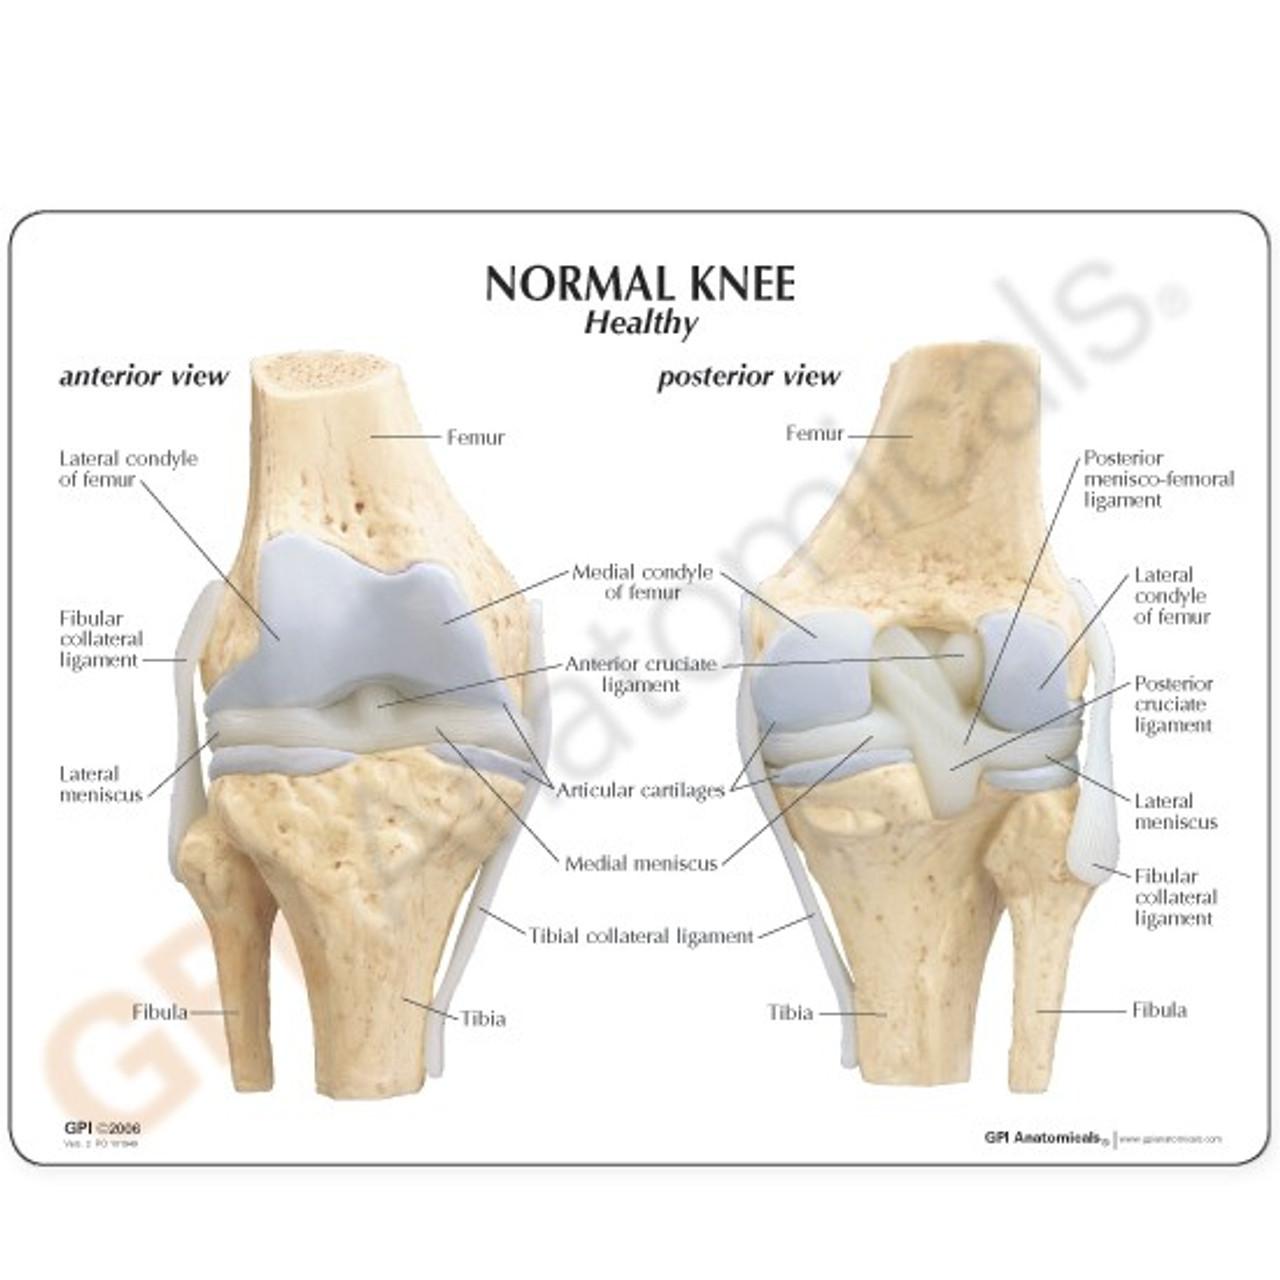 Osteoarthritis Knee Model Description Card